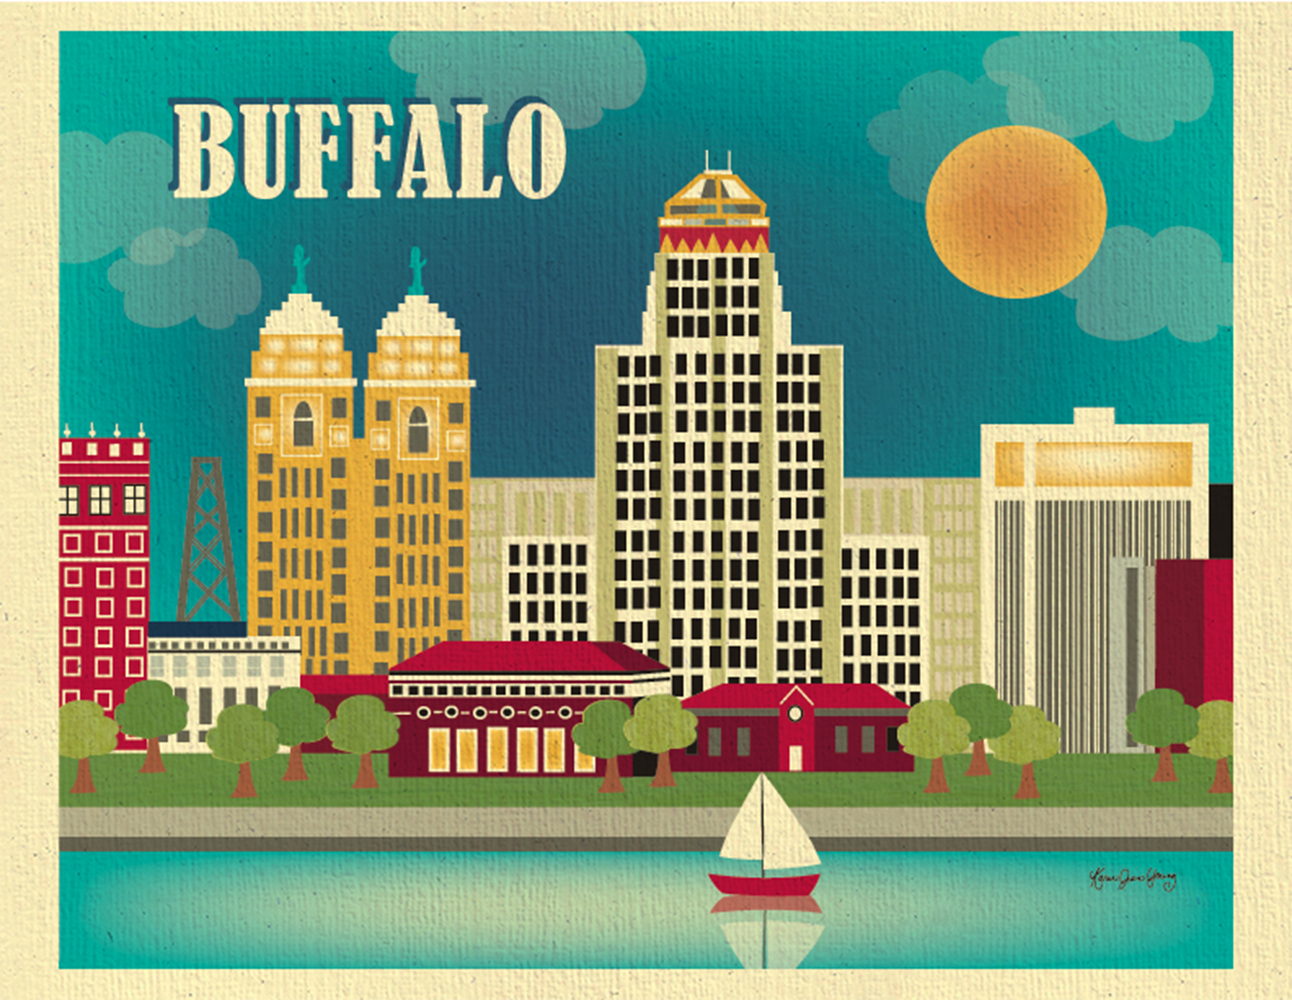 Buffalo new york skyline city wall poster print art for for Craft stores buffalo ny